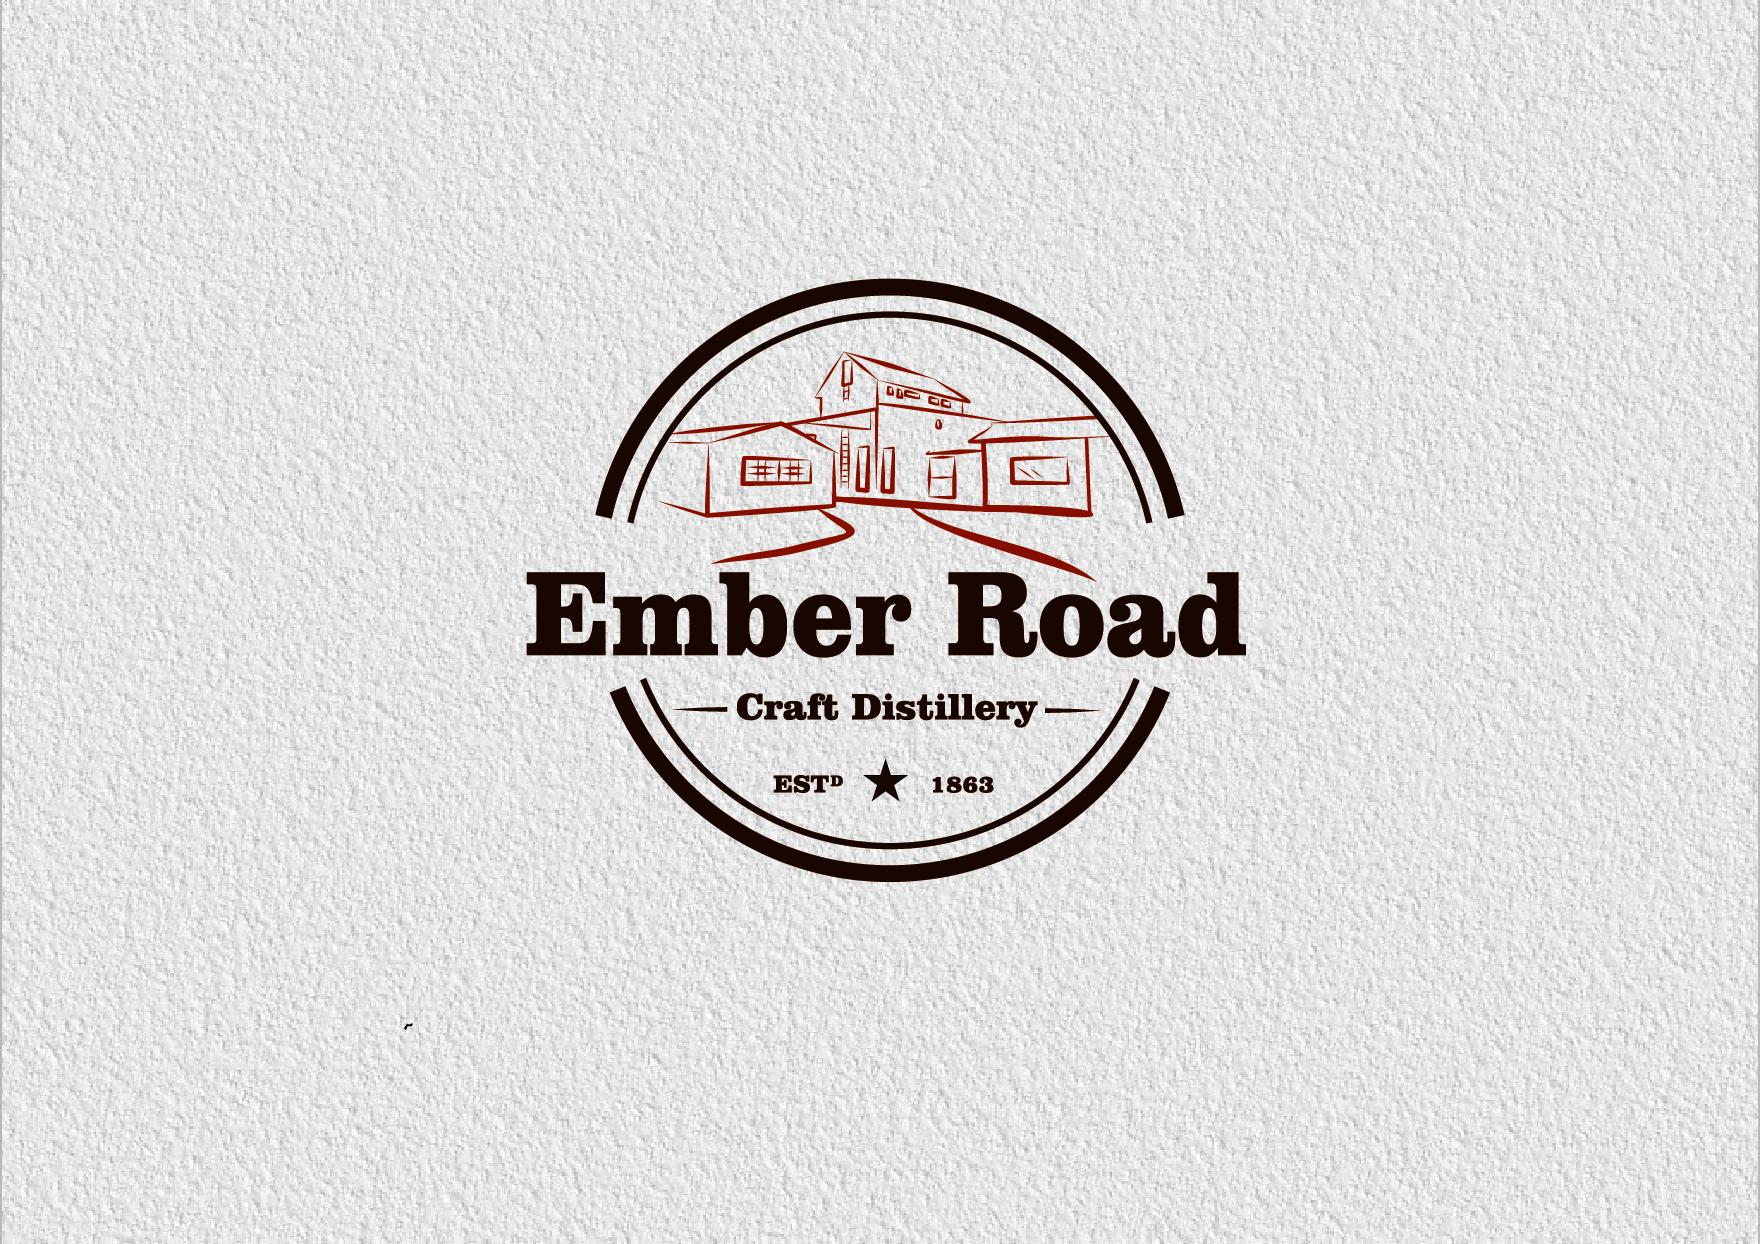 Ember Road needs a new logo